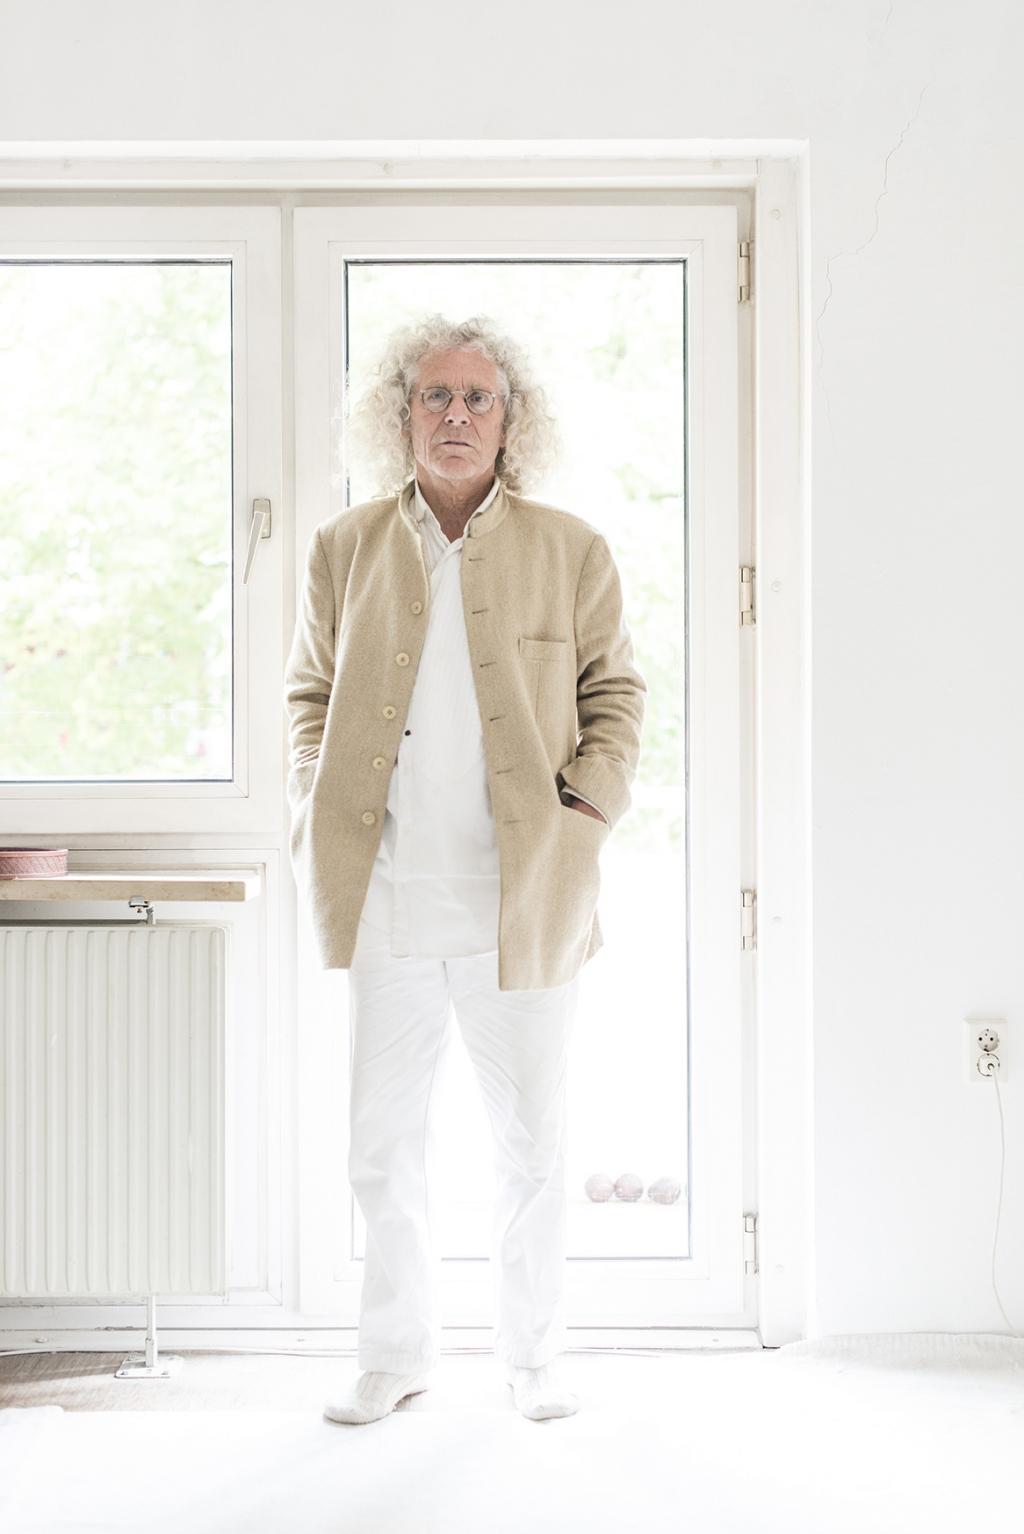 Lukas Schramm Fotografie Rainer Langhans, DING 2 Magazin (form Magazin)